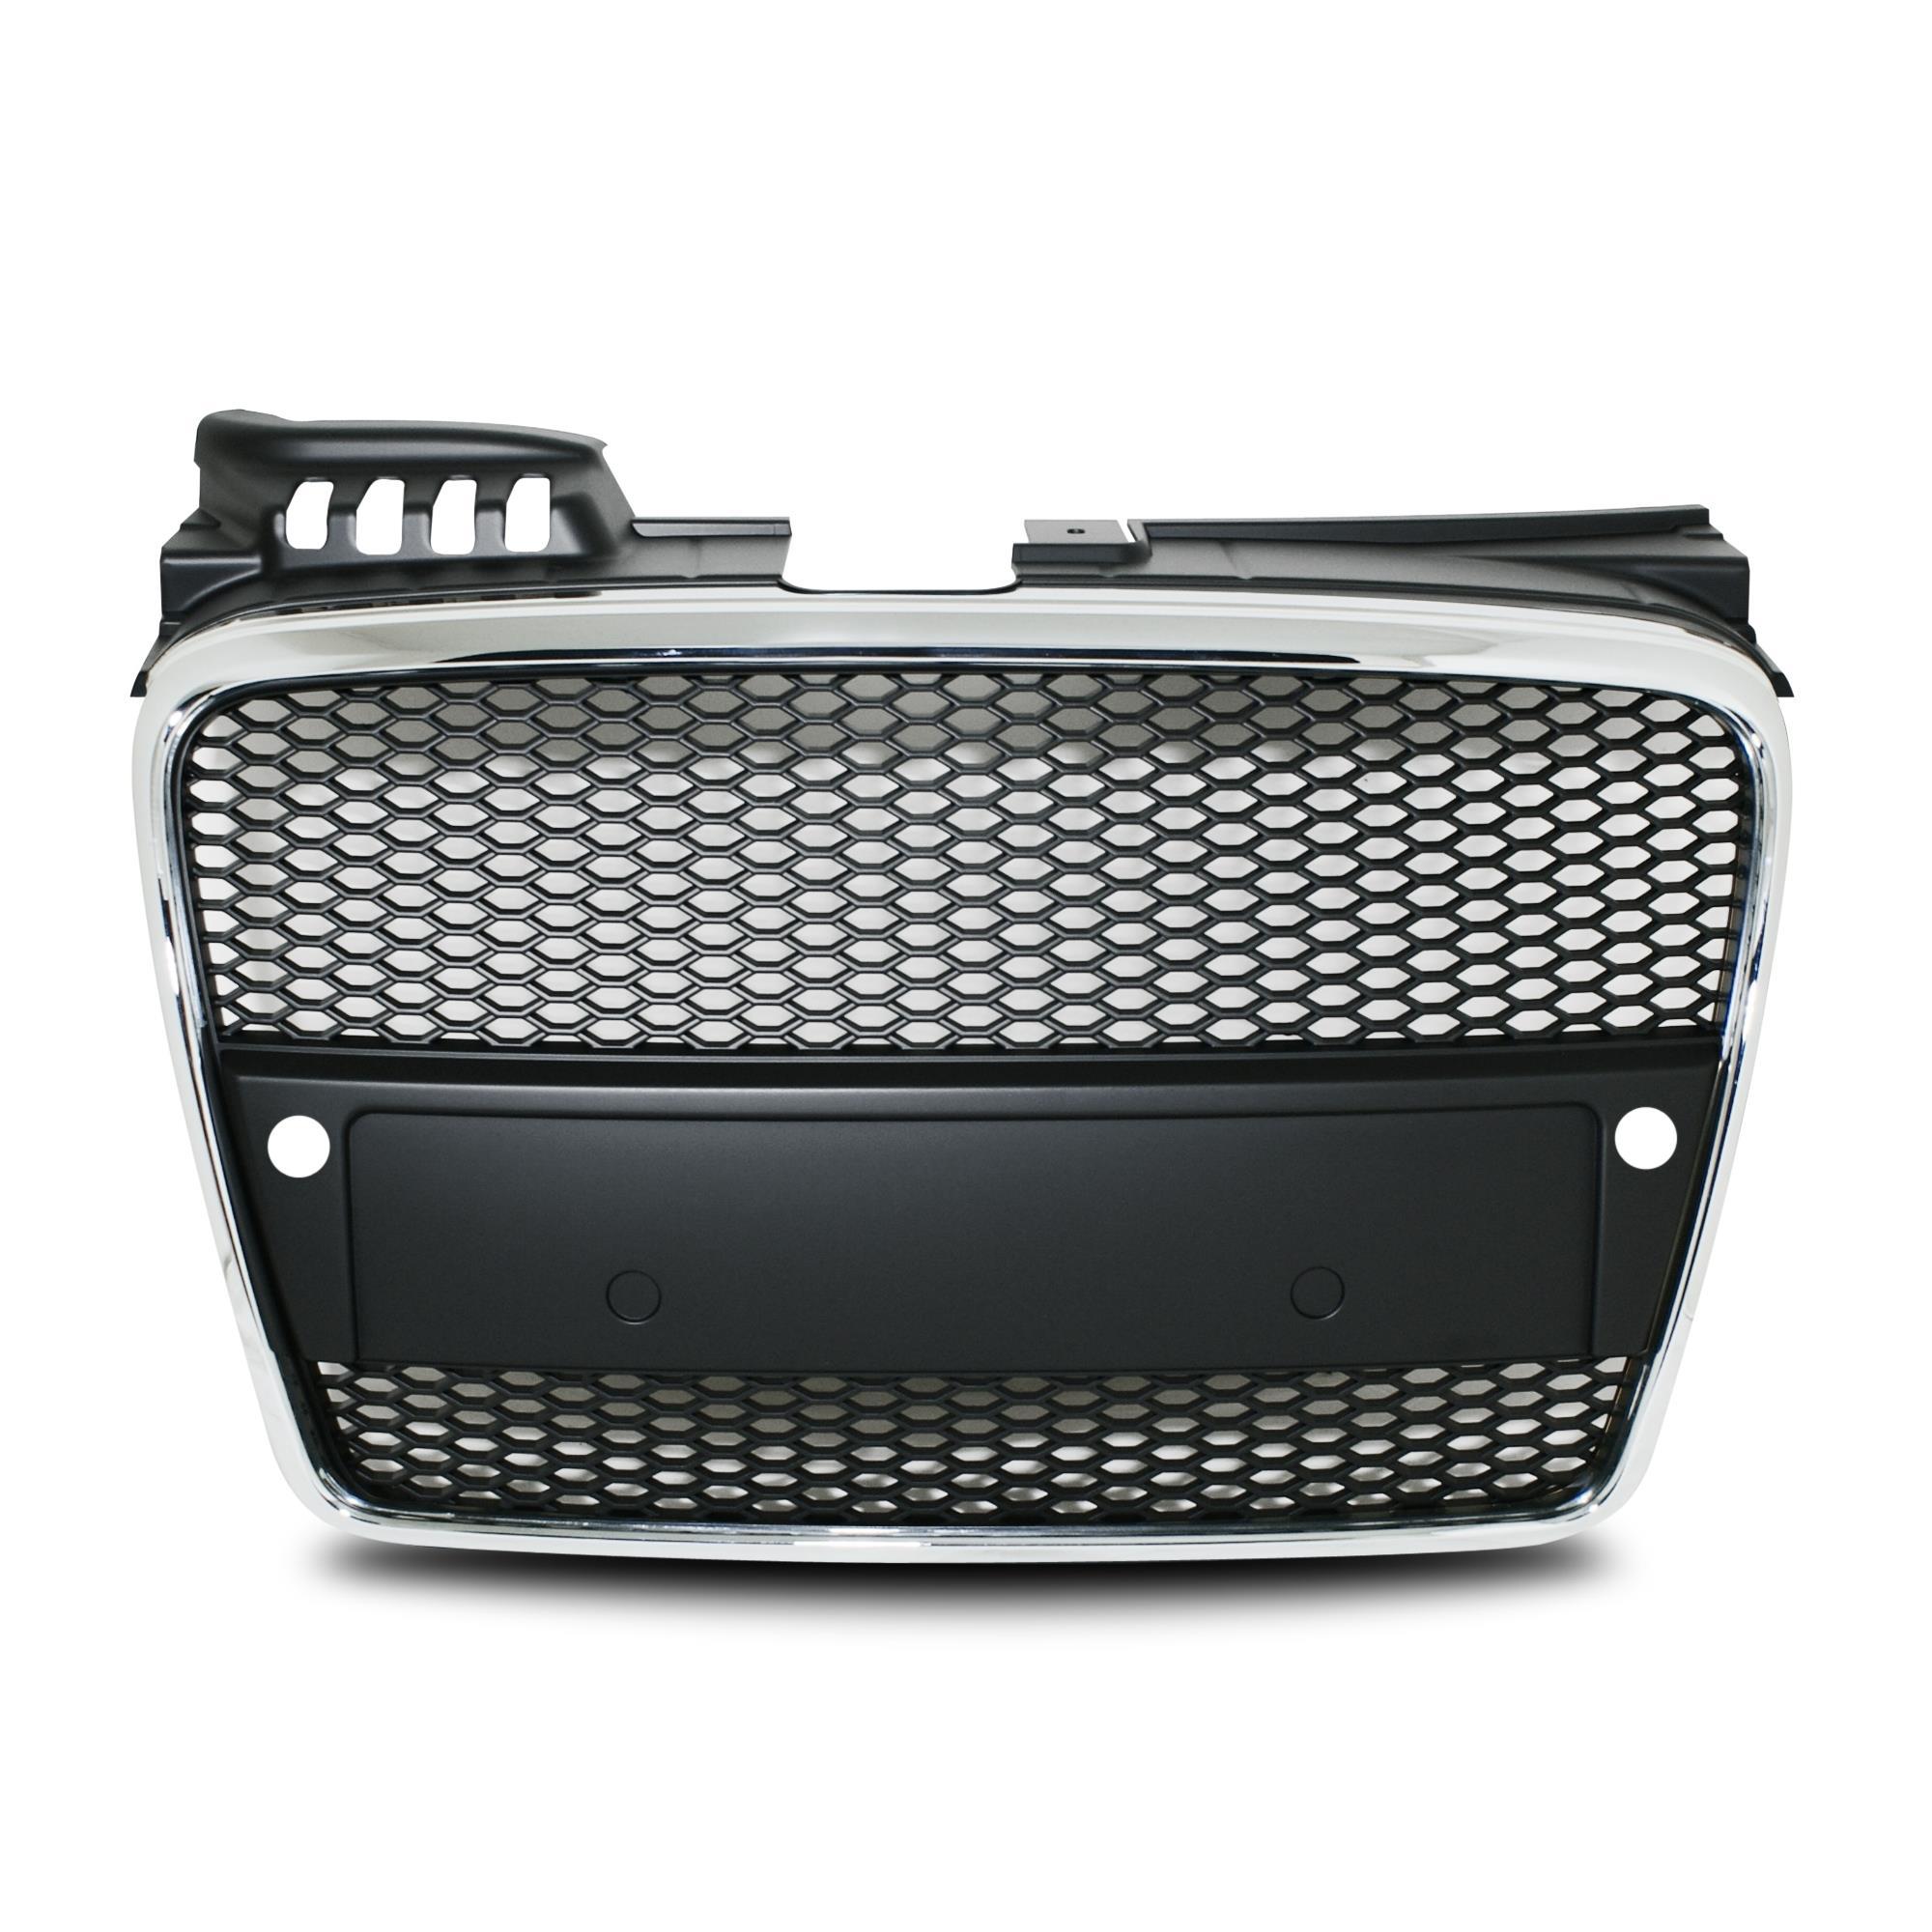 K hlergrill sport grill audi a4 8e b7 waben gitter schwarz for Fenster sparfuchs